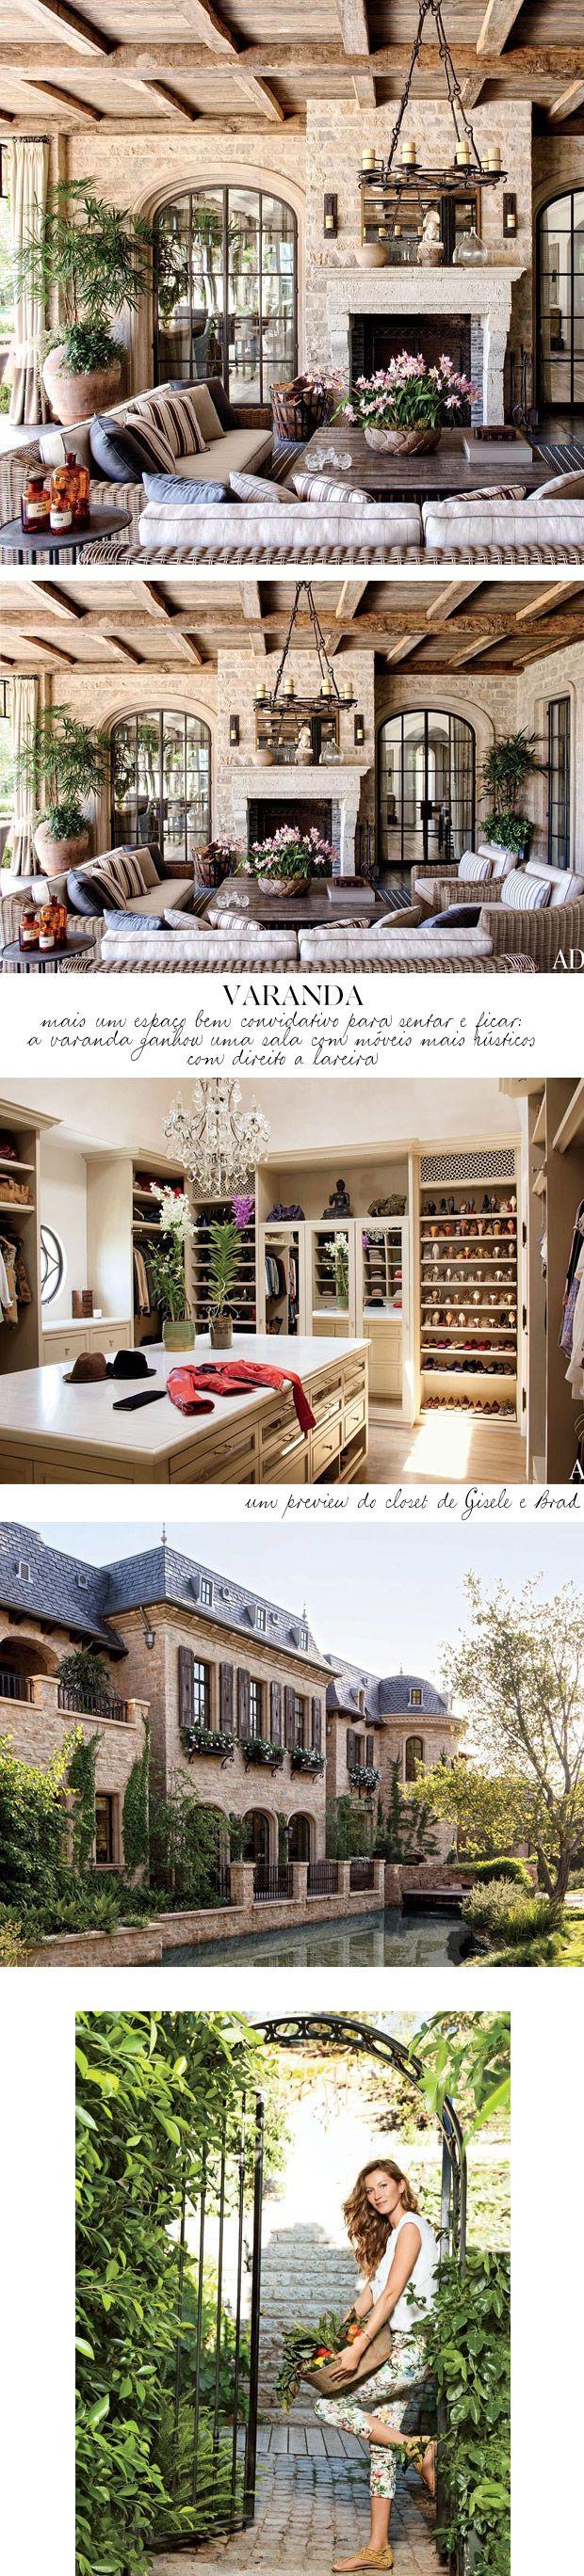 living-gazette-barbara-resende-decor-tour-gisele-bundchen-house-los-angeles